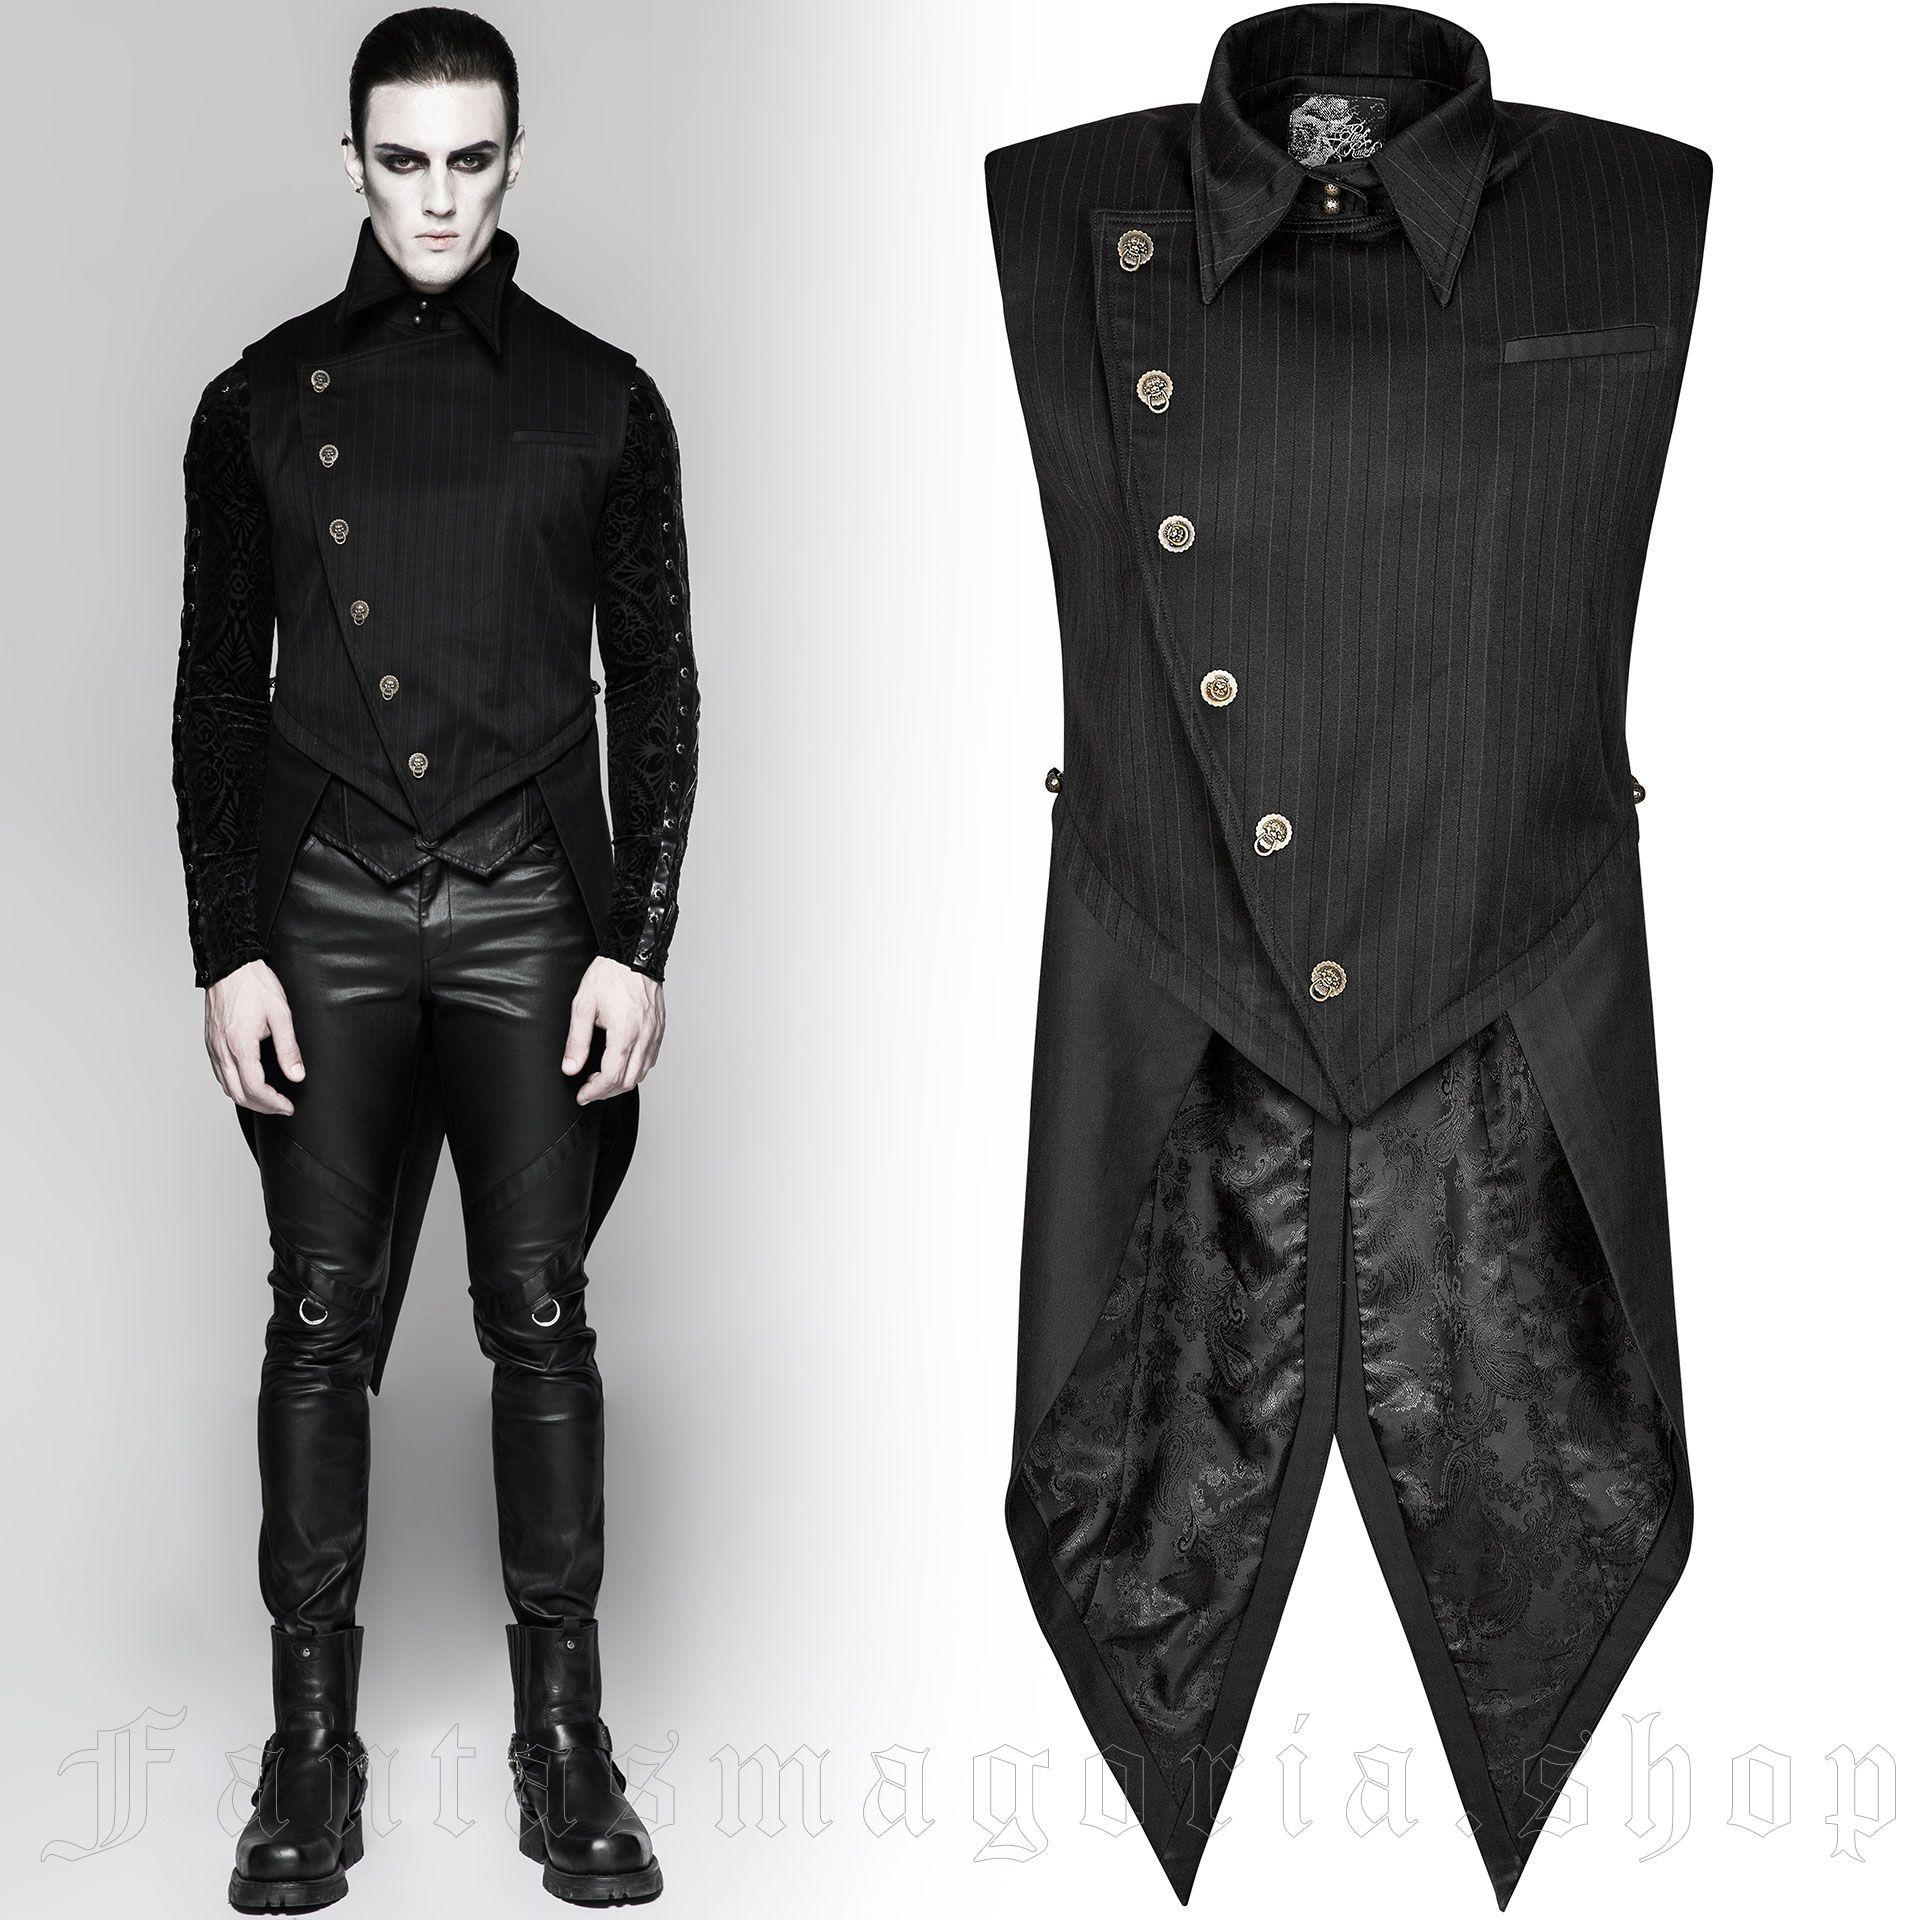 men's Mephisto Waistcoat by PUNK RAVE brand, code: Y-763